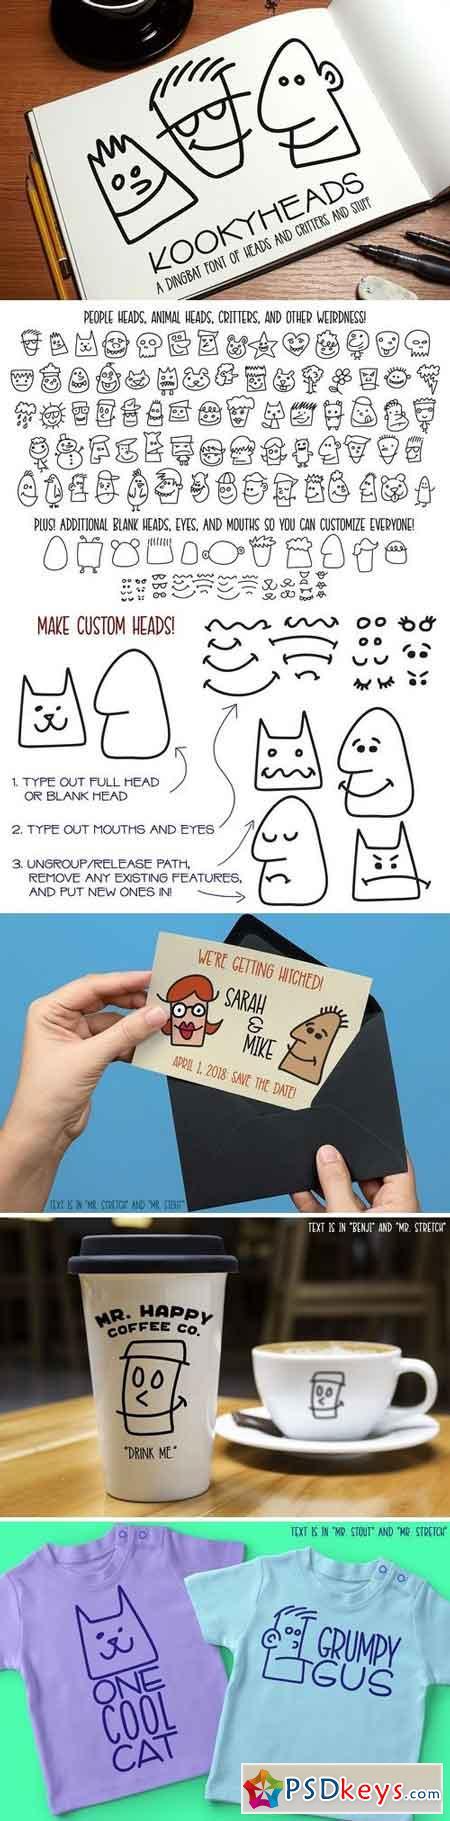 Kookyheads - a dingbat doodle font! 2031569